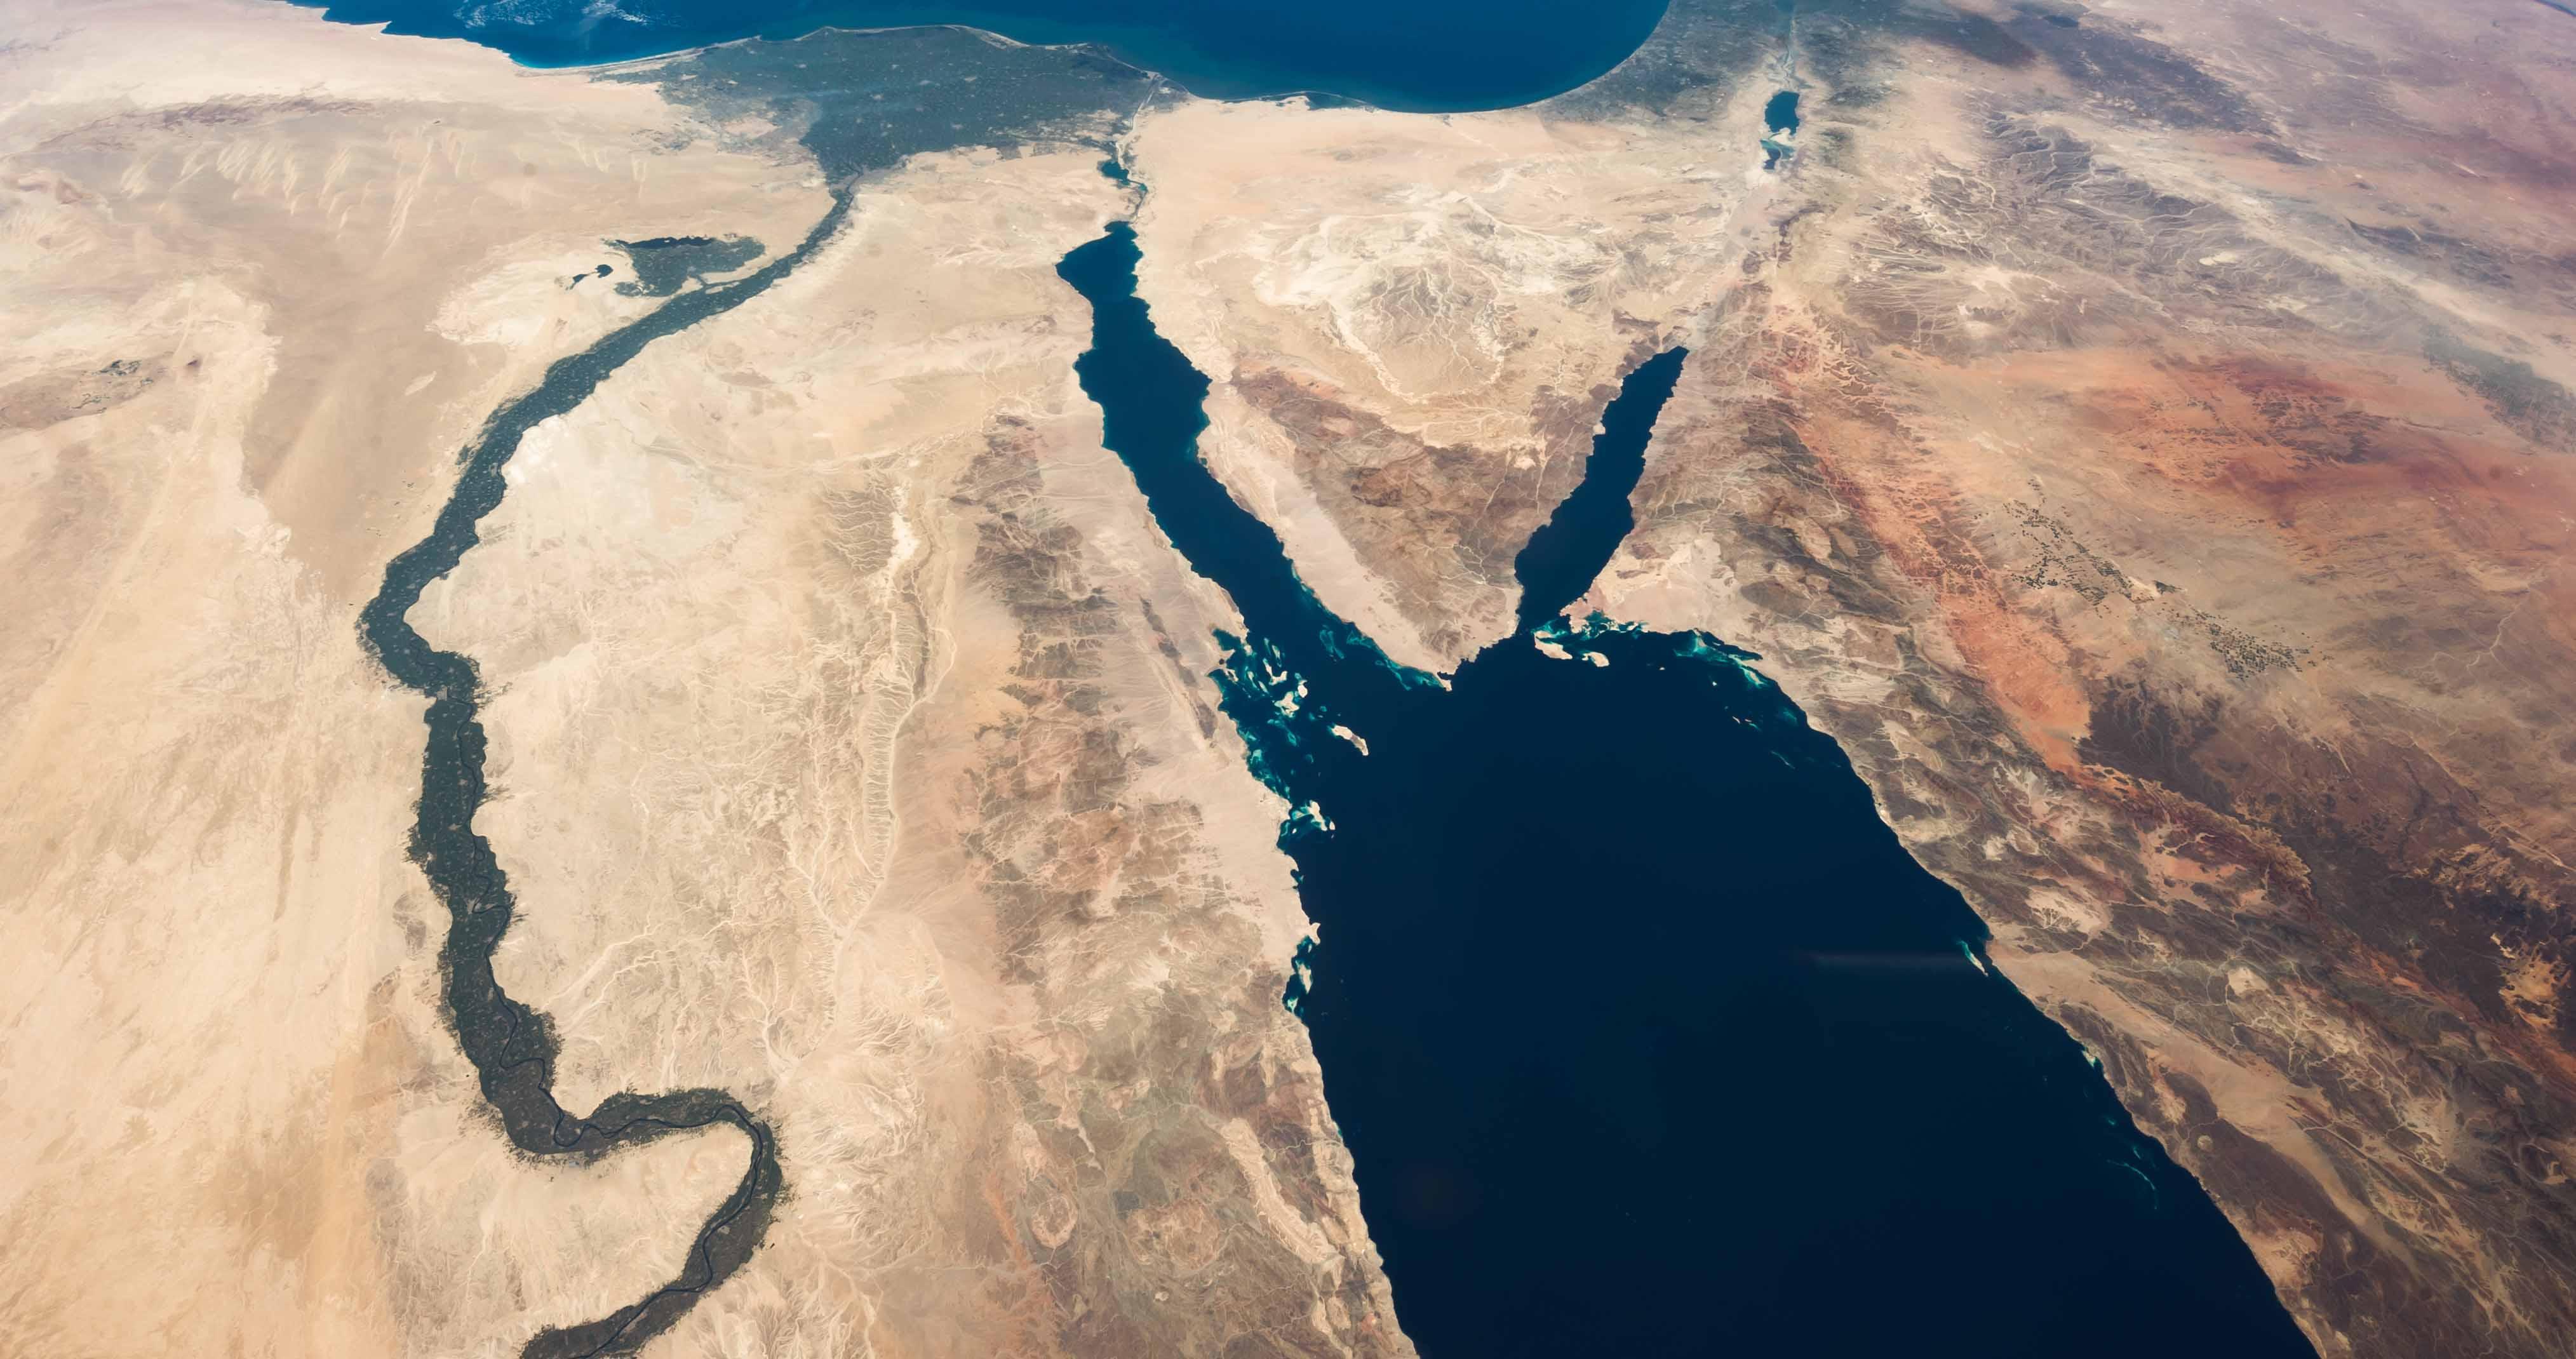 The Nile River and the Sinai Peninsula (Photo: Nasa)